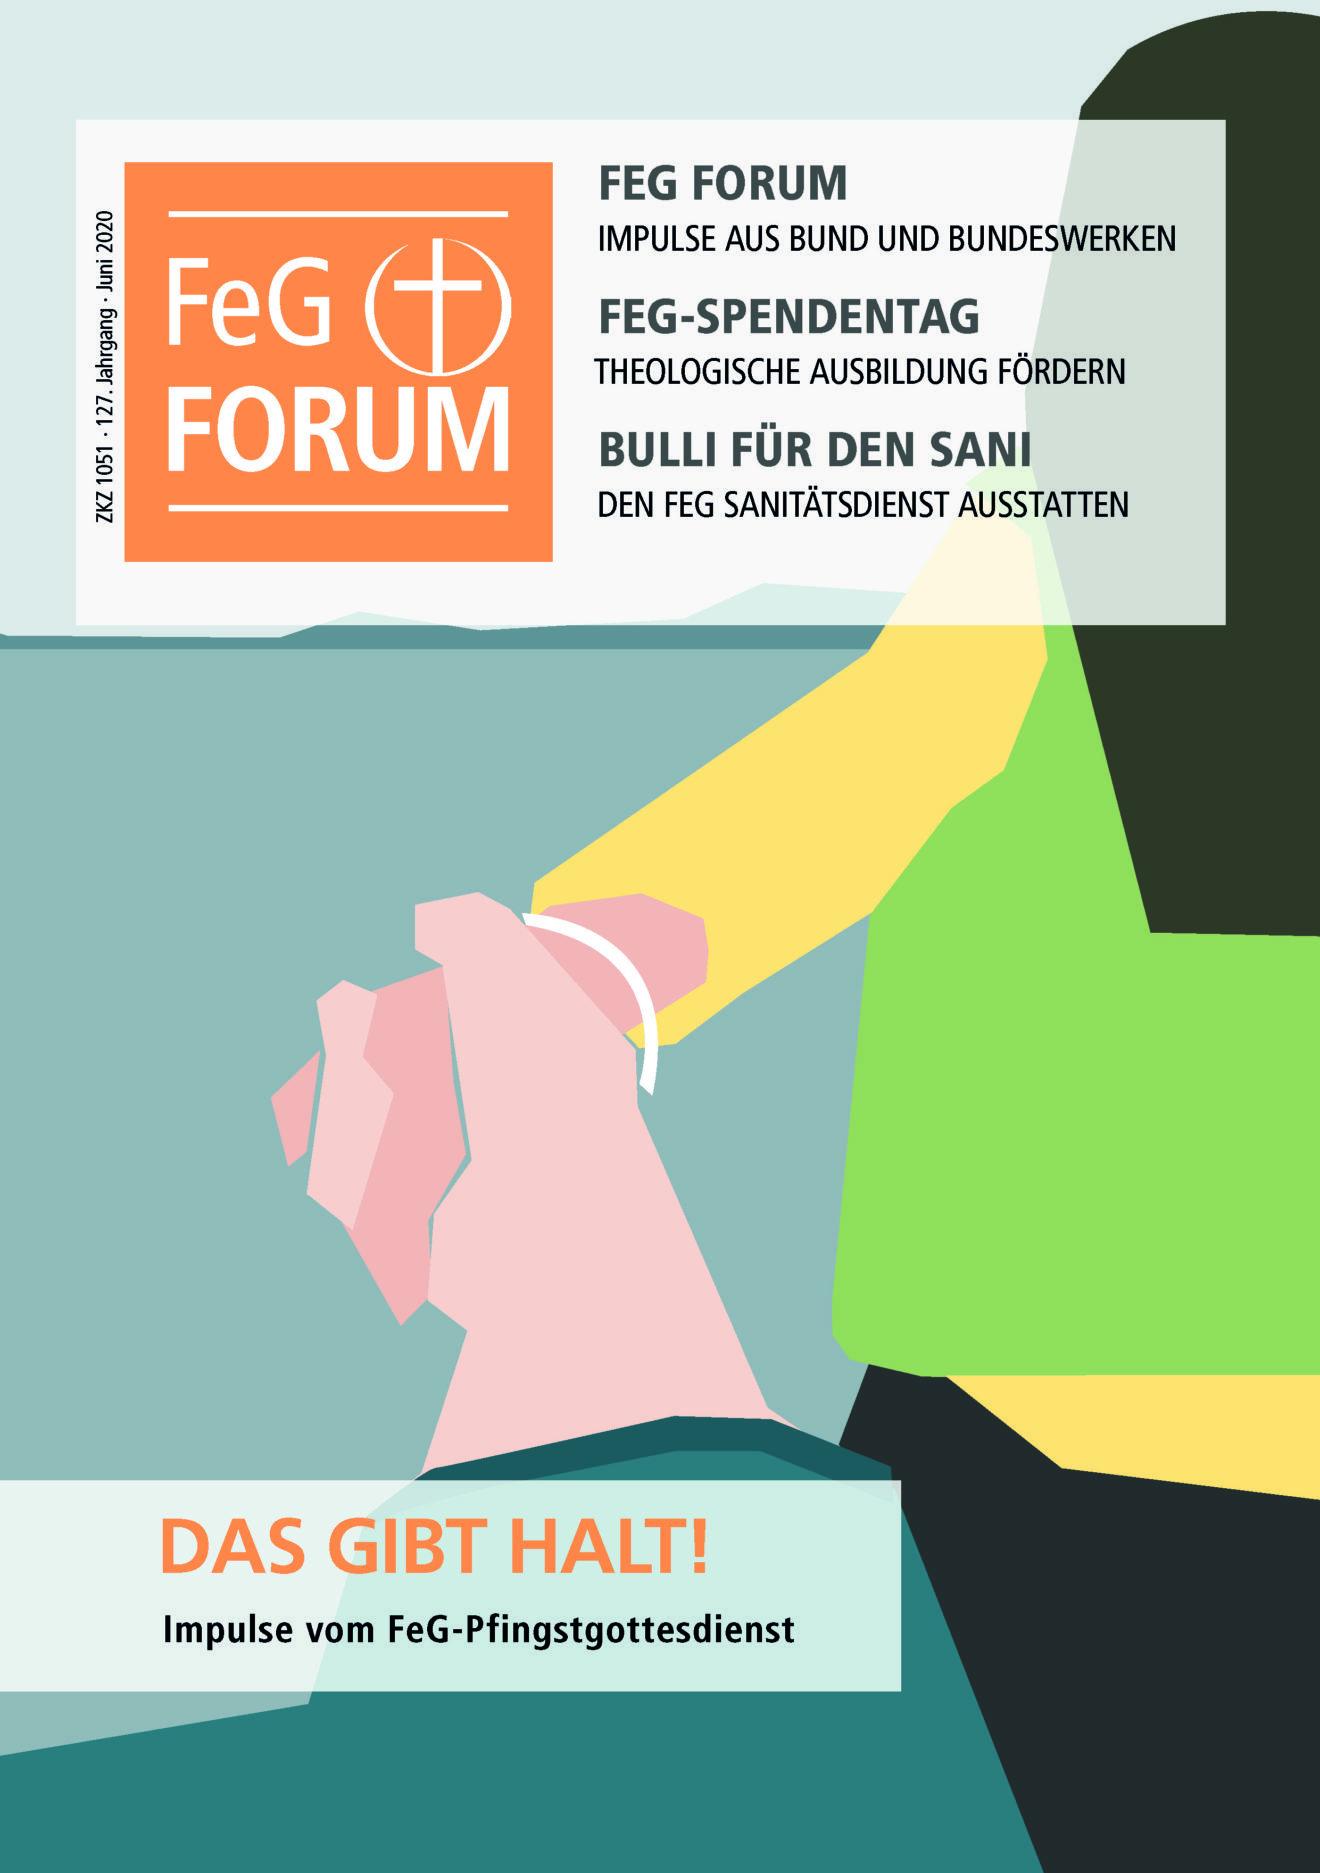 2020/06 FeG Forum